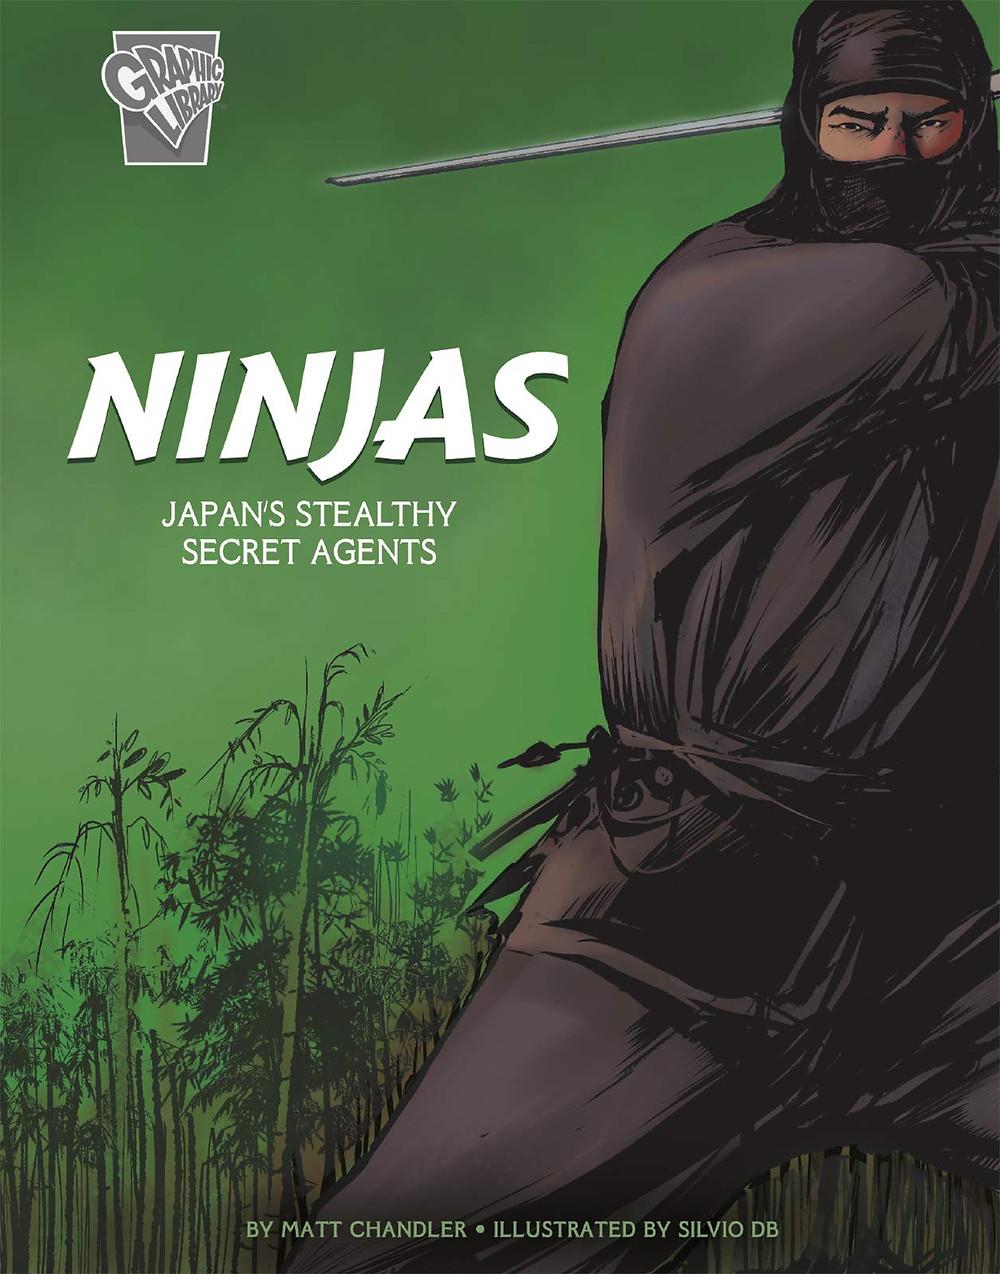 Ninjas- A graphic novel February 1, 2019